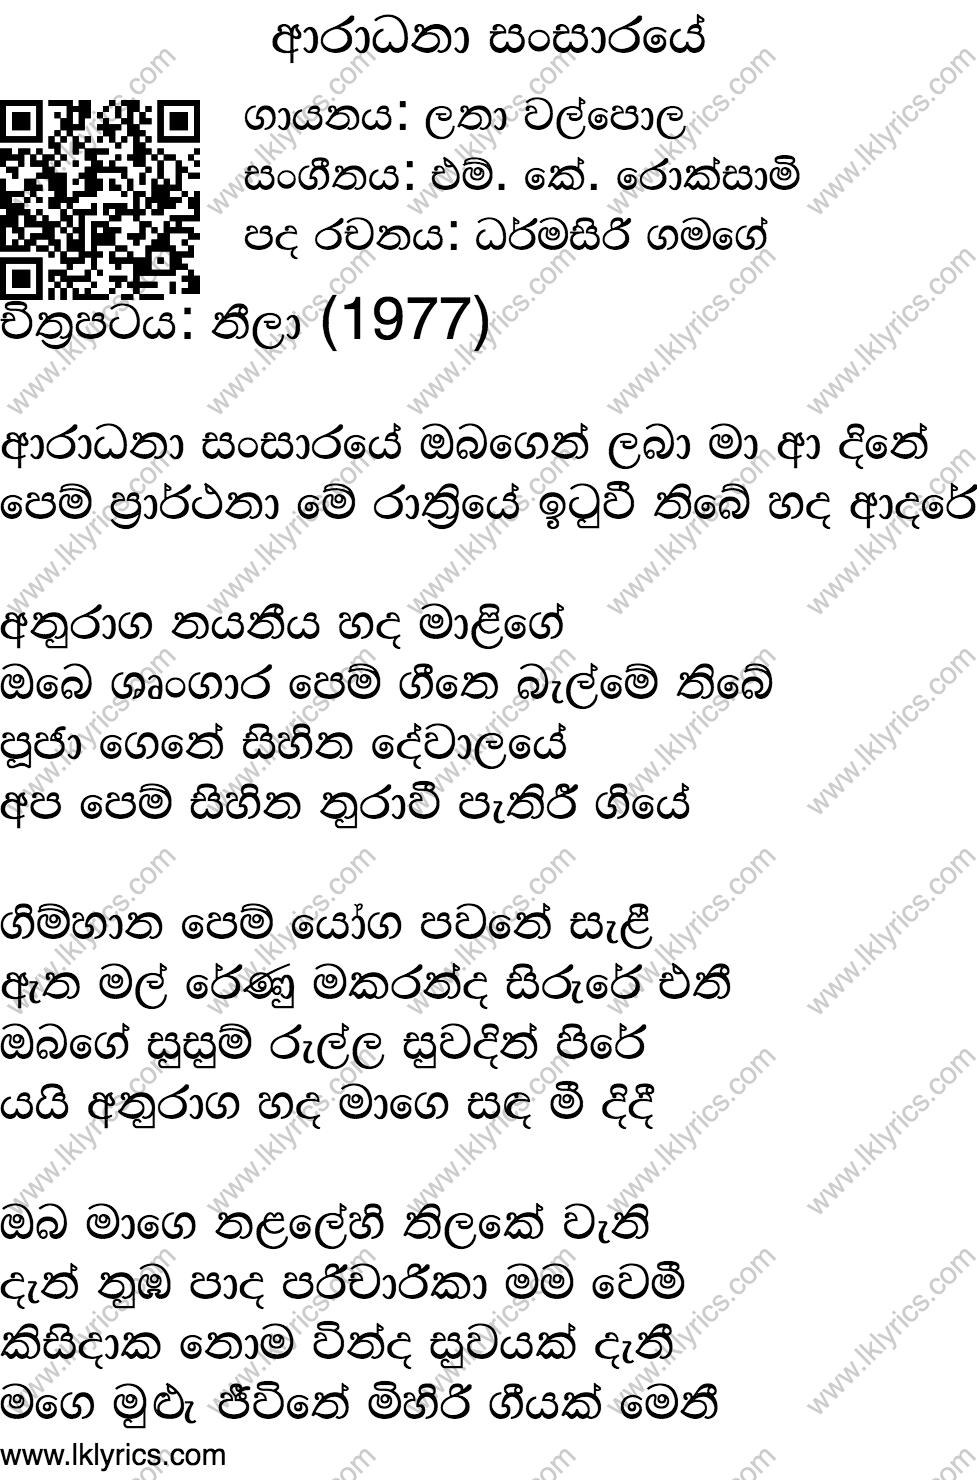 Aradhana Songs Lyrics - Are Emaindi Song Lyrics - Telugu ...